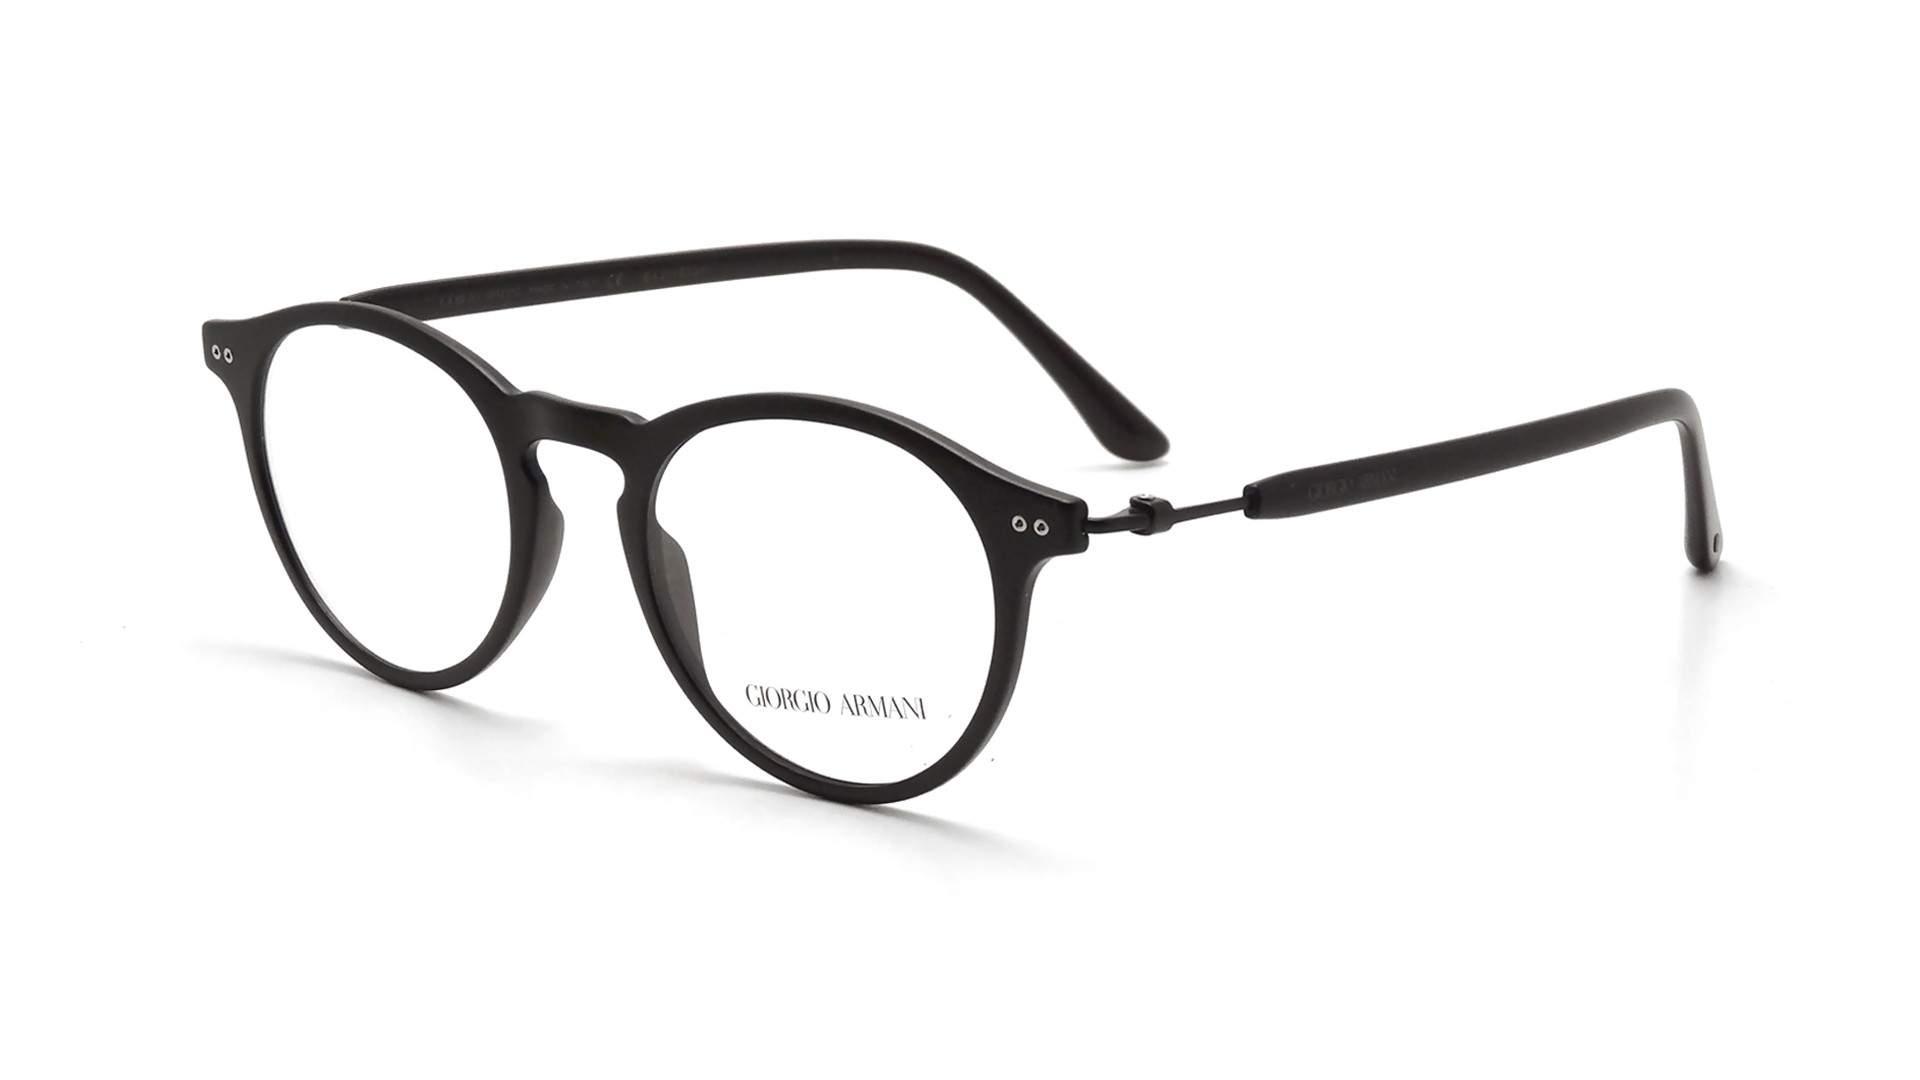 a6bedb51eff Lunettes de vue Giorgio Armani Frames Of Life Noir Mat AR7040 5042 48-19  Medium